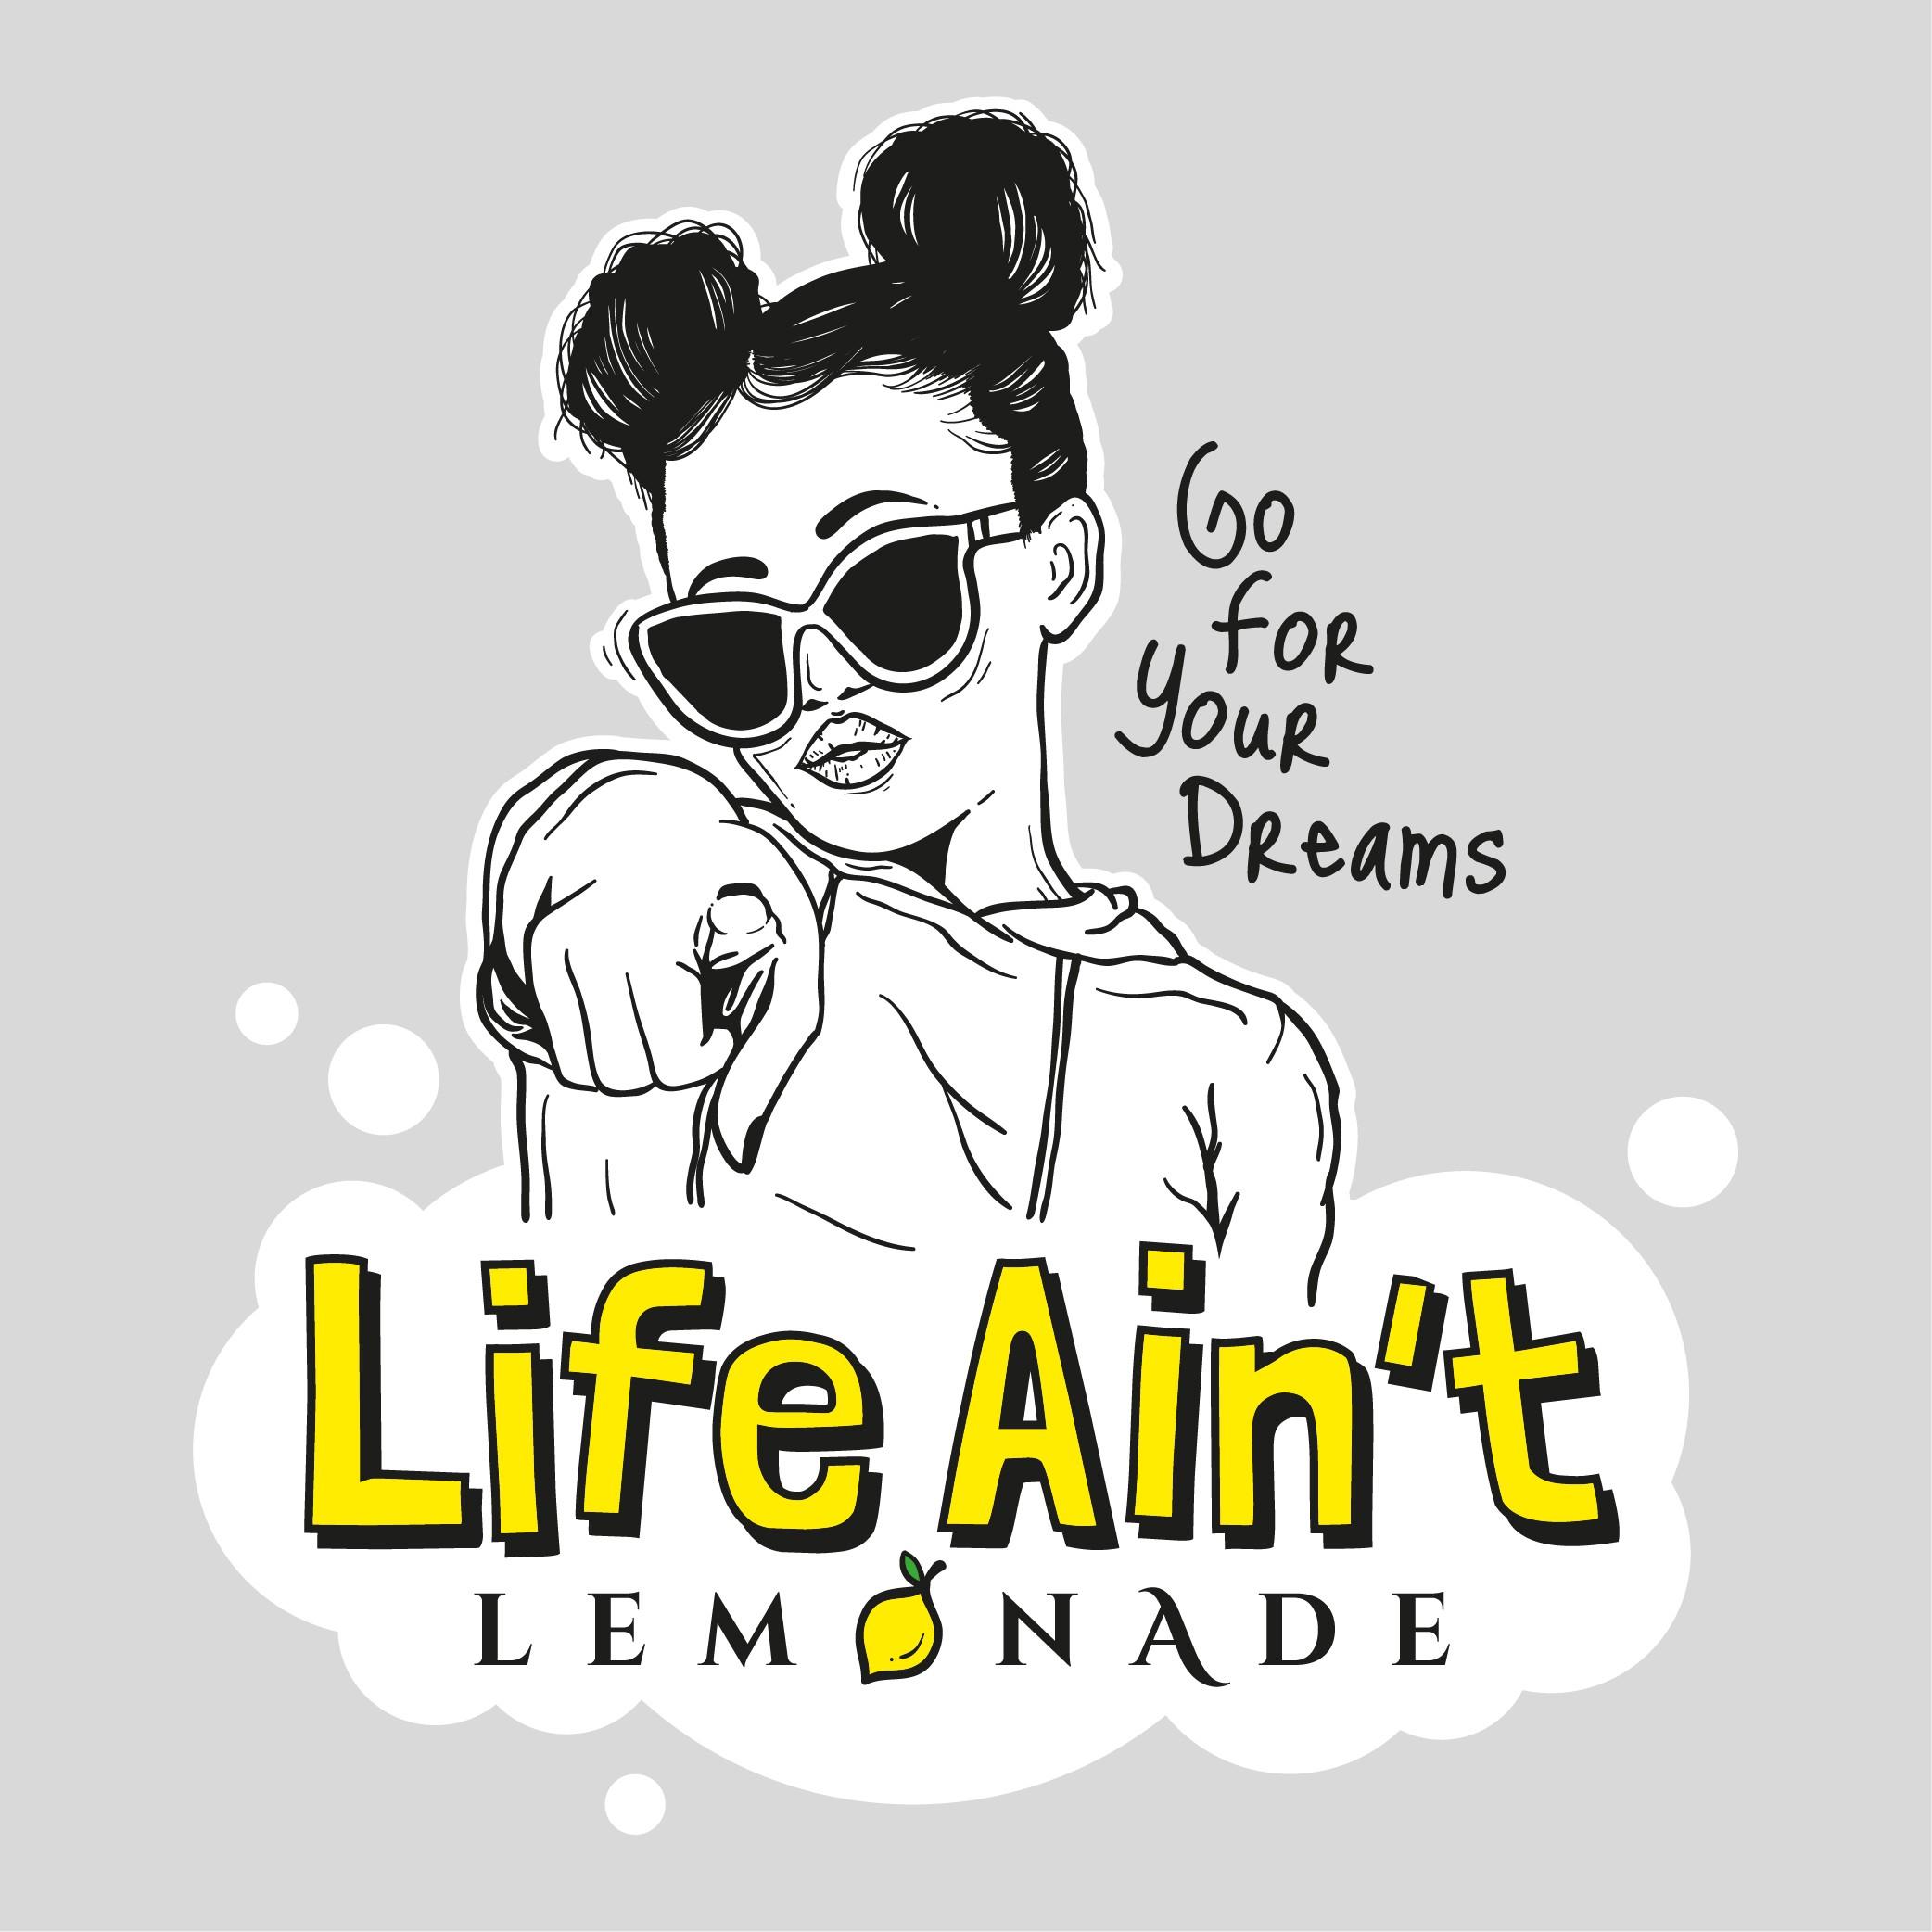 Young rapper needs logo for new Lemonade beverage brand